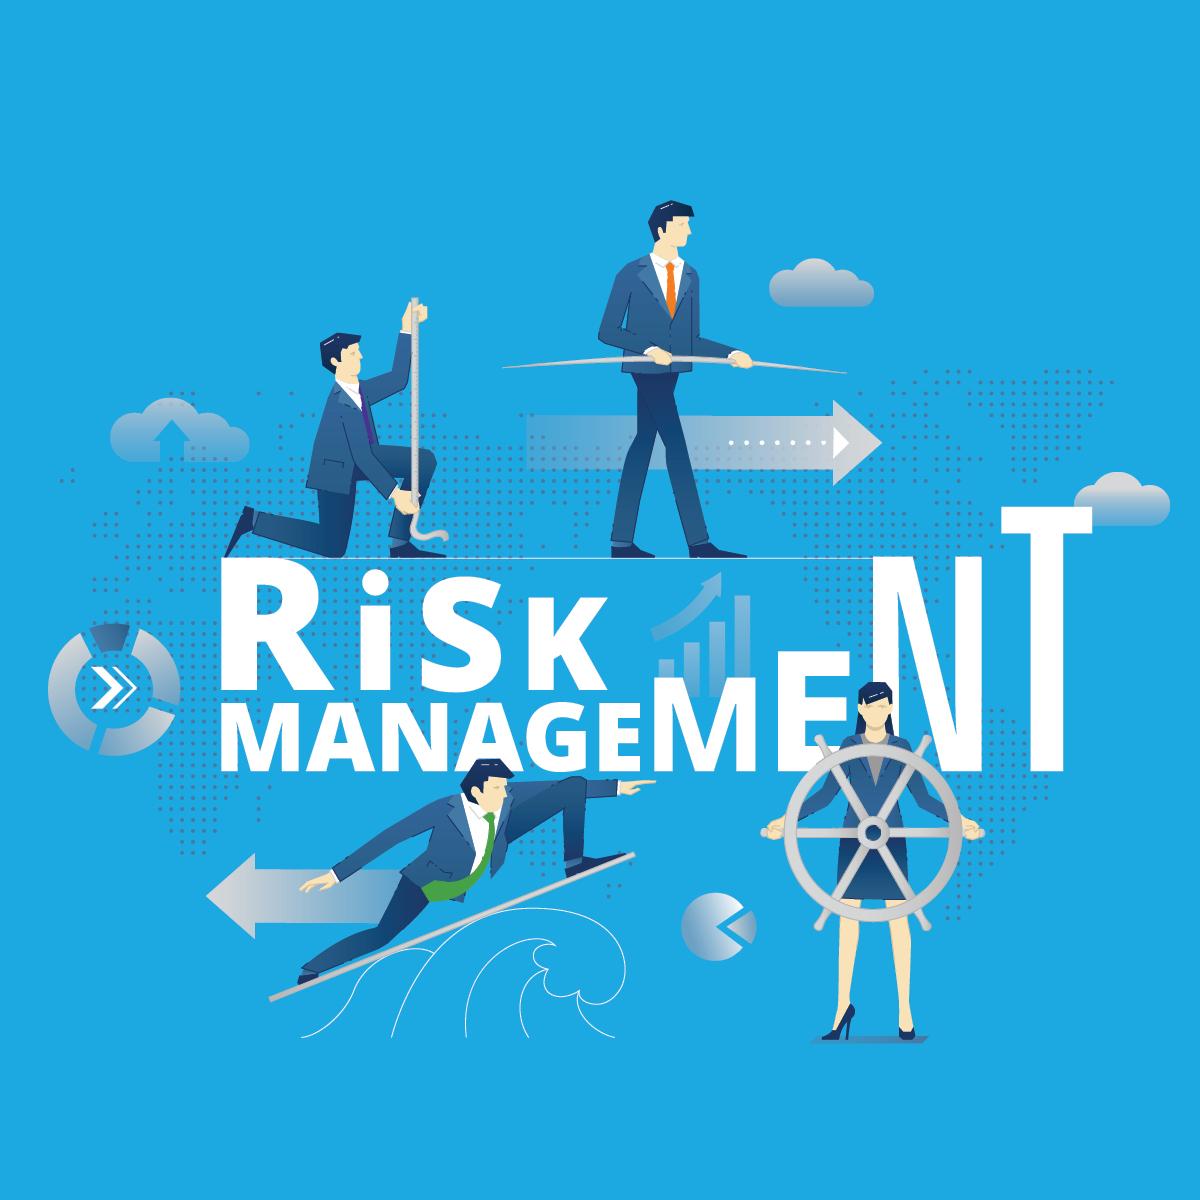 Risk Management Main Image